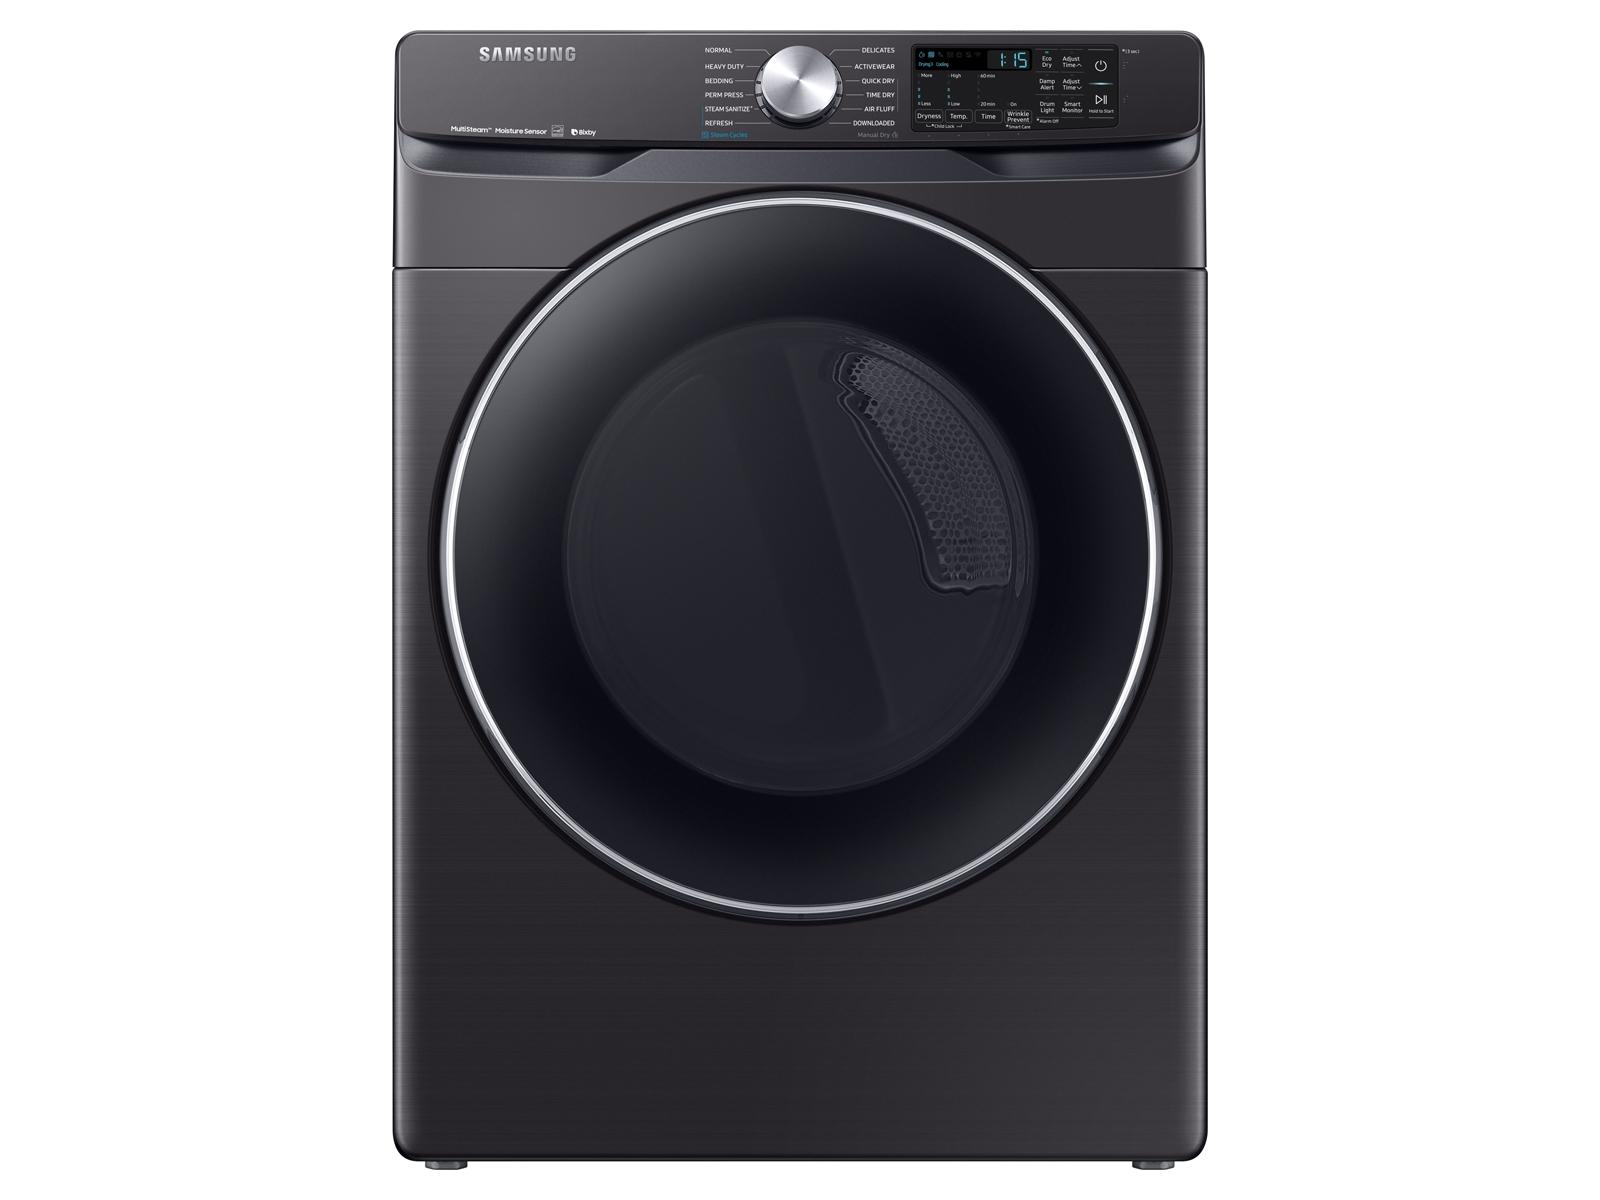 Samsung 7.5 cu. ft. Smart Gas Dryer with Steam Sanitize+ in Black Stainless Steel, Fingerprint Resistant Black Stainless Steel